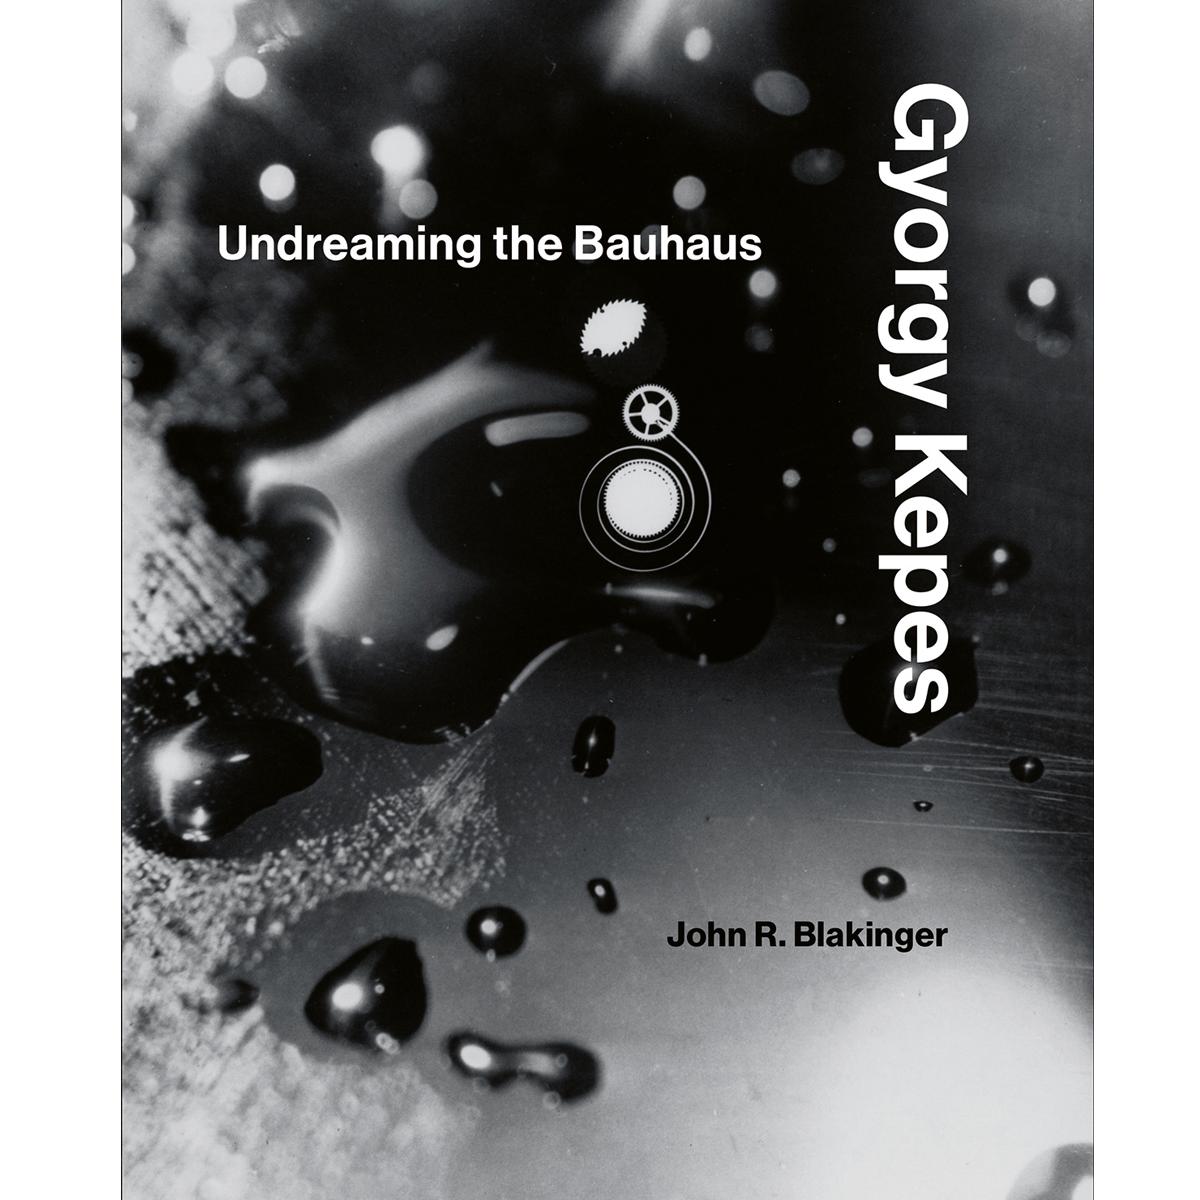 Gyorgy Kepes:  Undreaming the Bauhaus